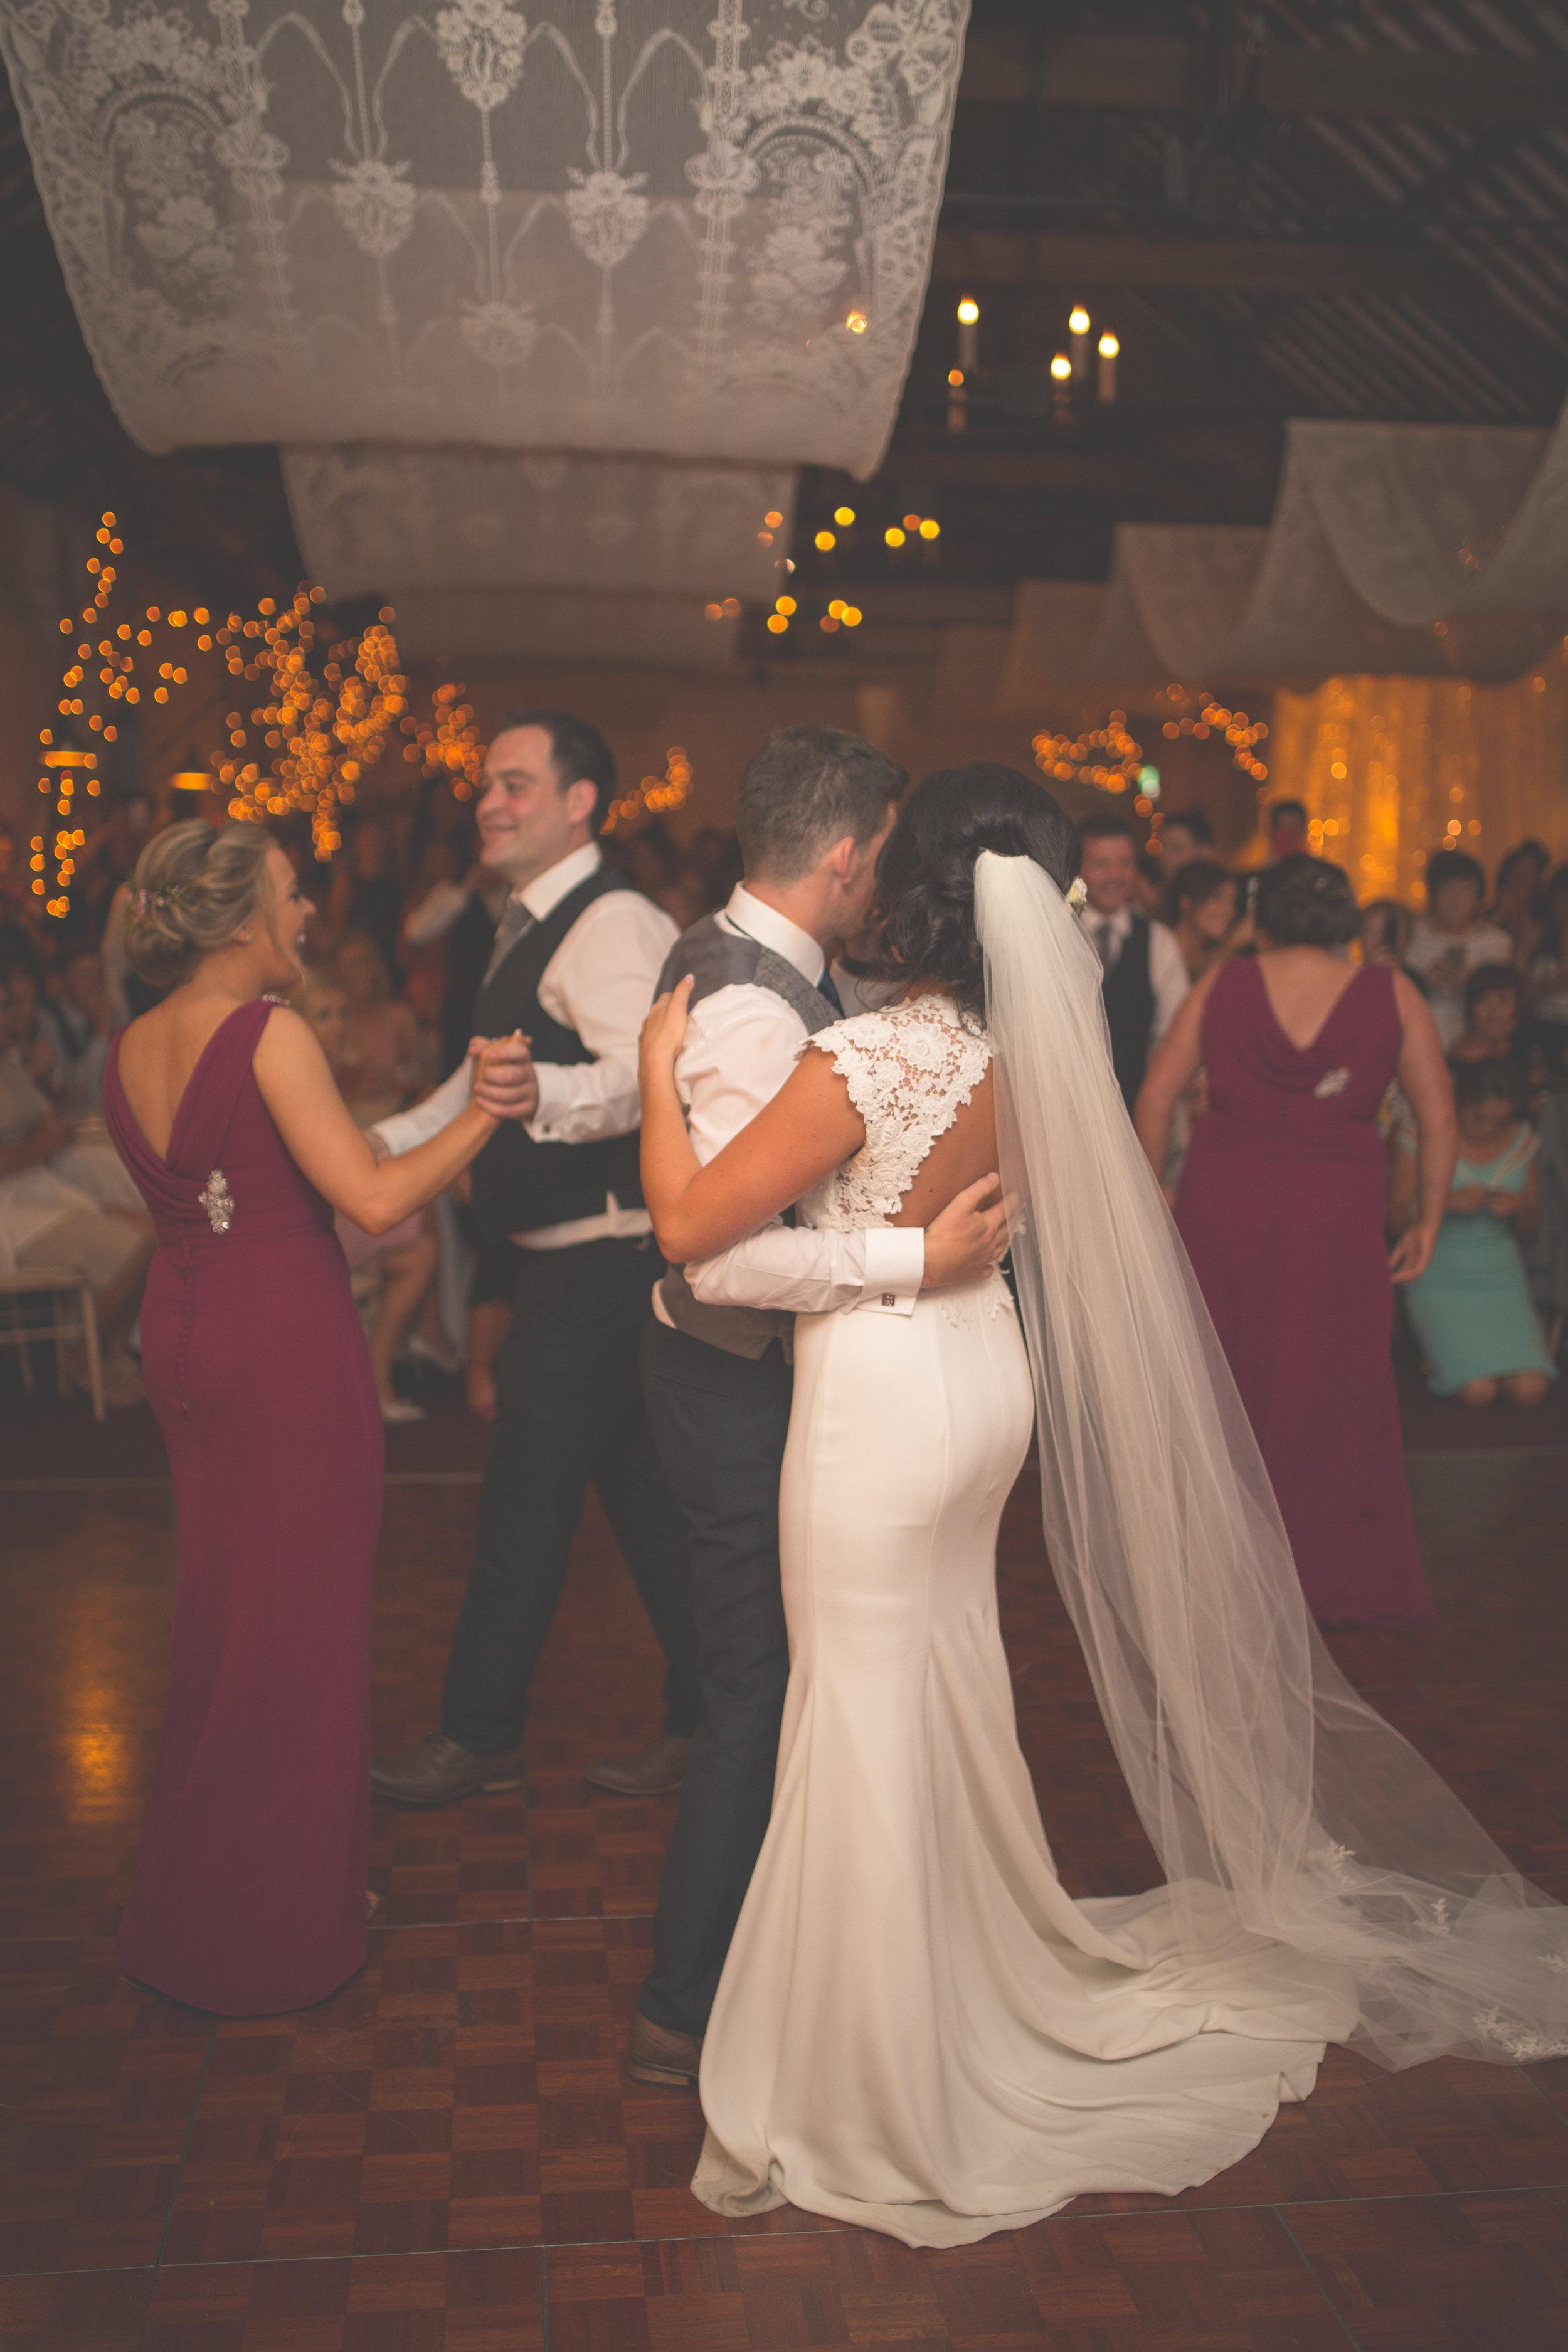 Brian McEwan Wedding Photography | Carol-Annee & Sean | The Dancing-32.jpg